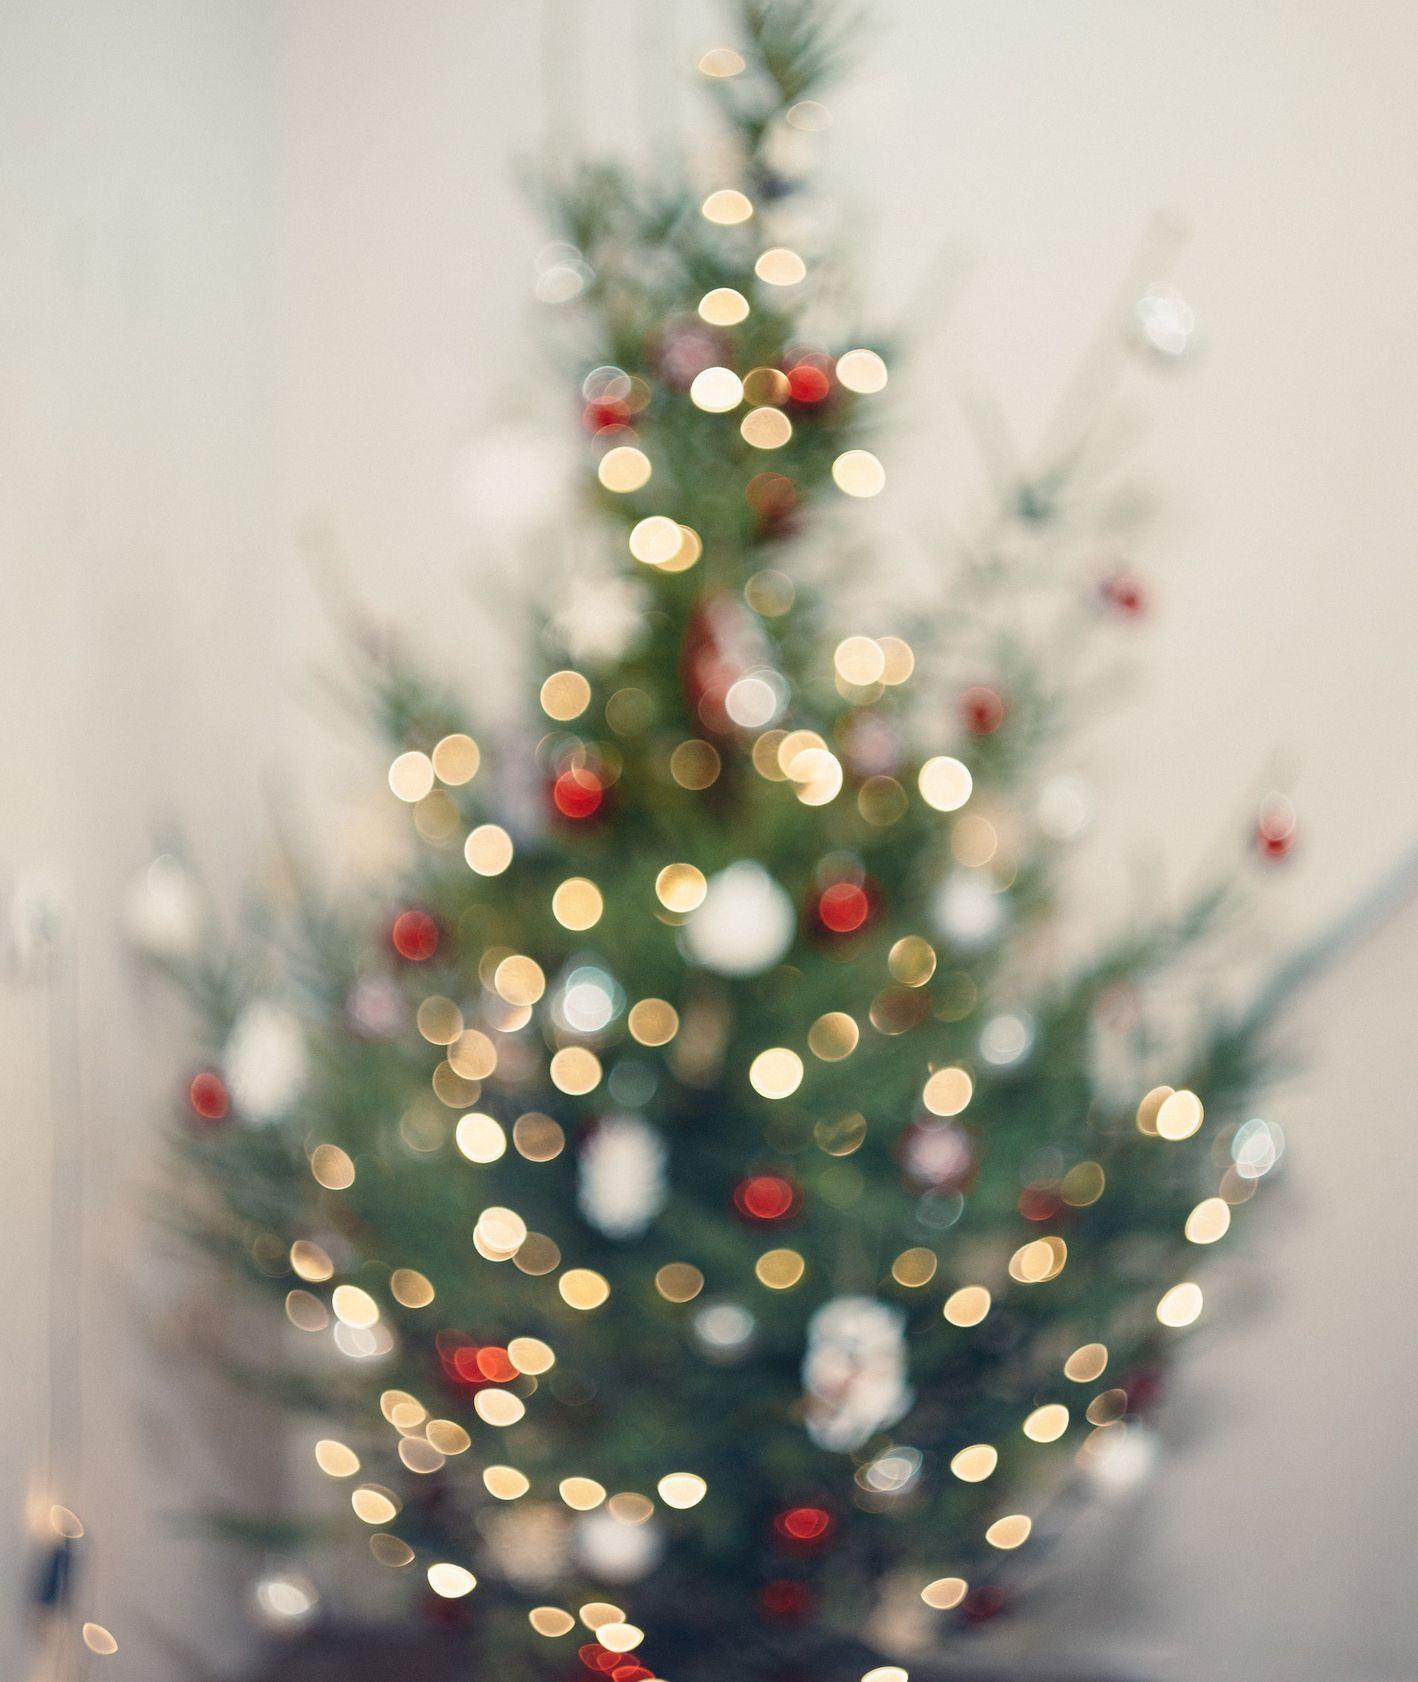 Świąteczna choinka (fot. Tatiana Predeina / unsplash.com)